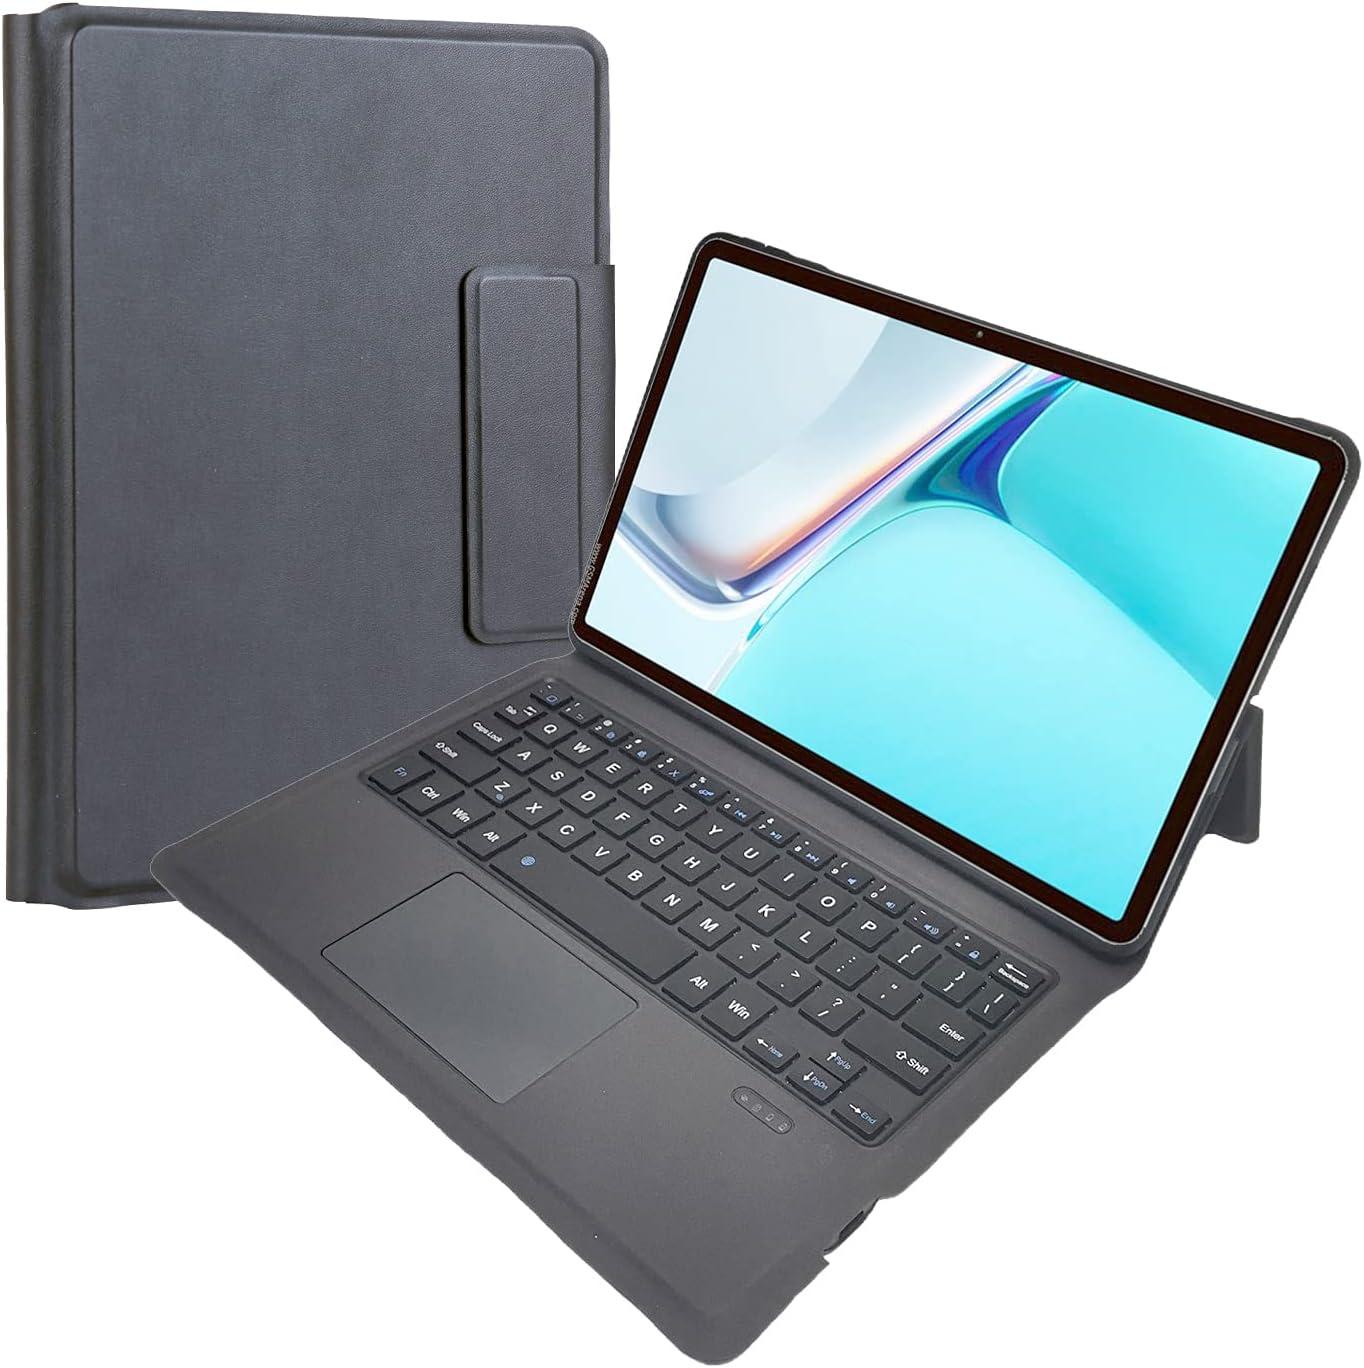 NB Ultra Thin Keyboard Case for Huawei MatePad 11, Ultra Slim Aluminium Keyboard Cover (TOUCHPAD Mouse) Smart Case for Huawei MatePad 11